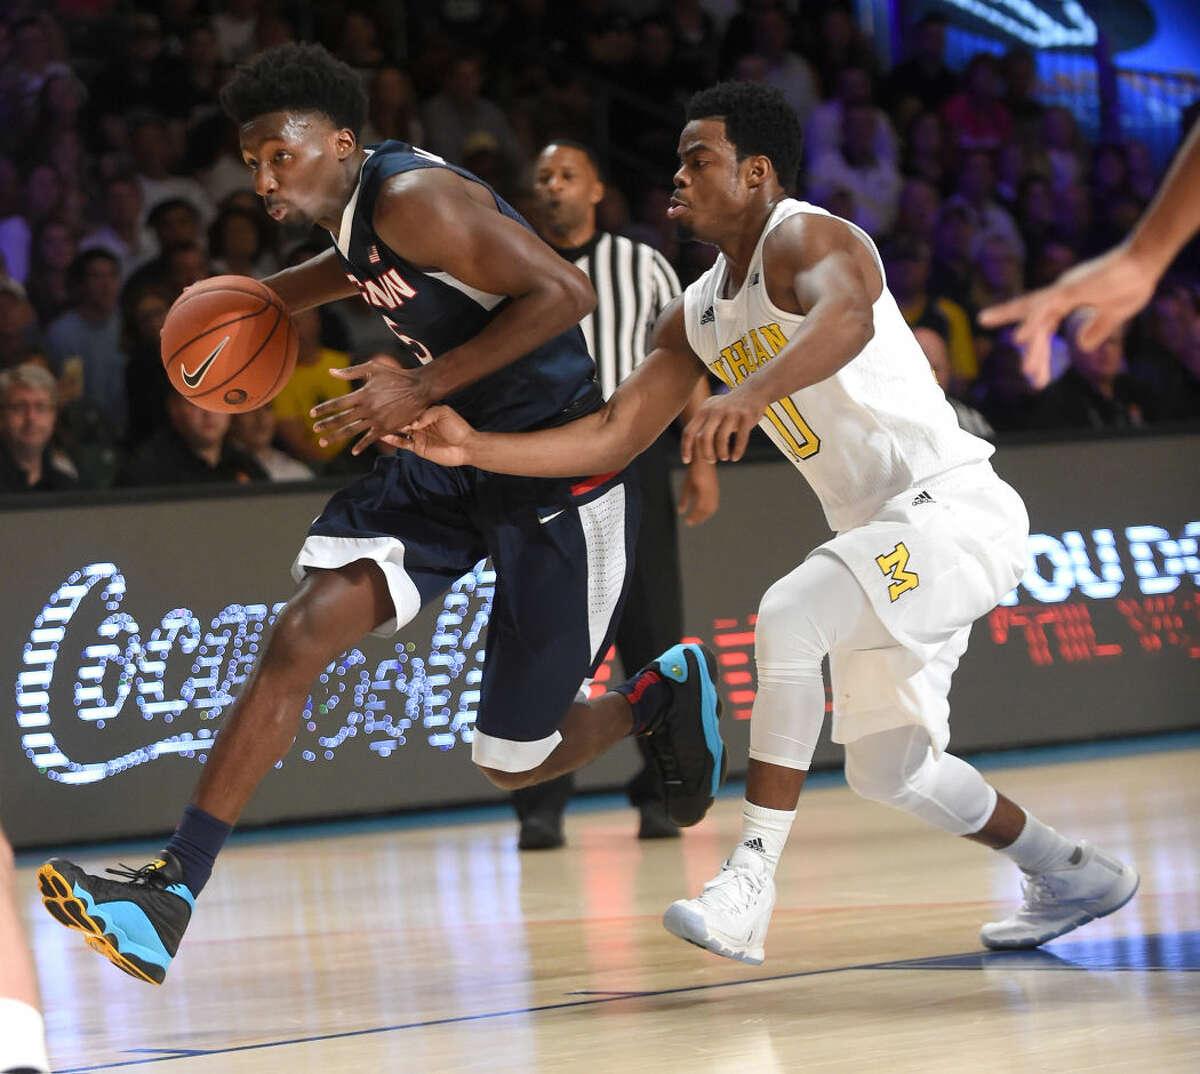 Connecticut forward Daniel Hamilton (5) drives to the basket past Michigan guard Derrick Walton Jr. (10) during an NCAA college basketball game at Paradise Island, Bahamas, Wednesday, Nov. 25, 2015. (Brad Horrigan/The Courant via AP)